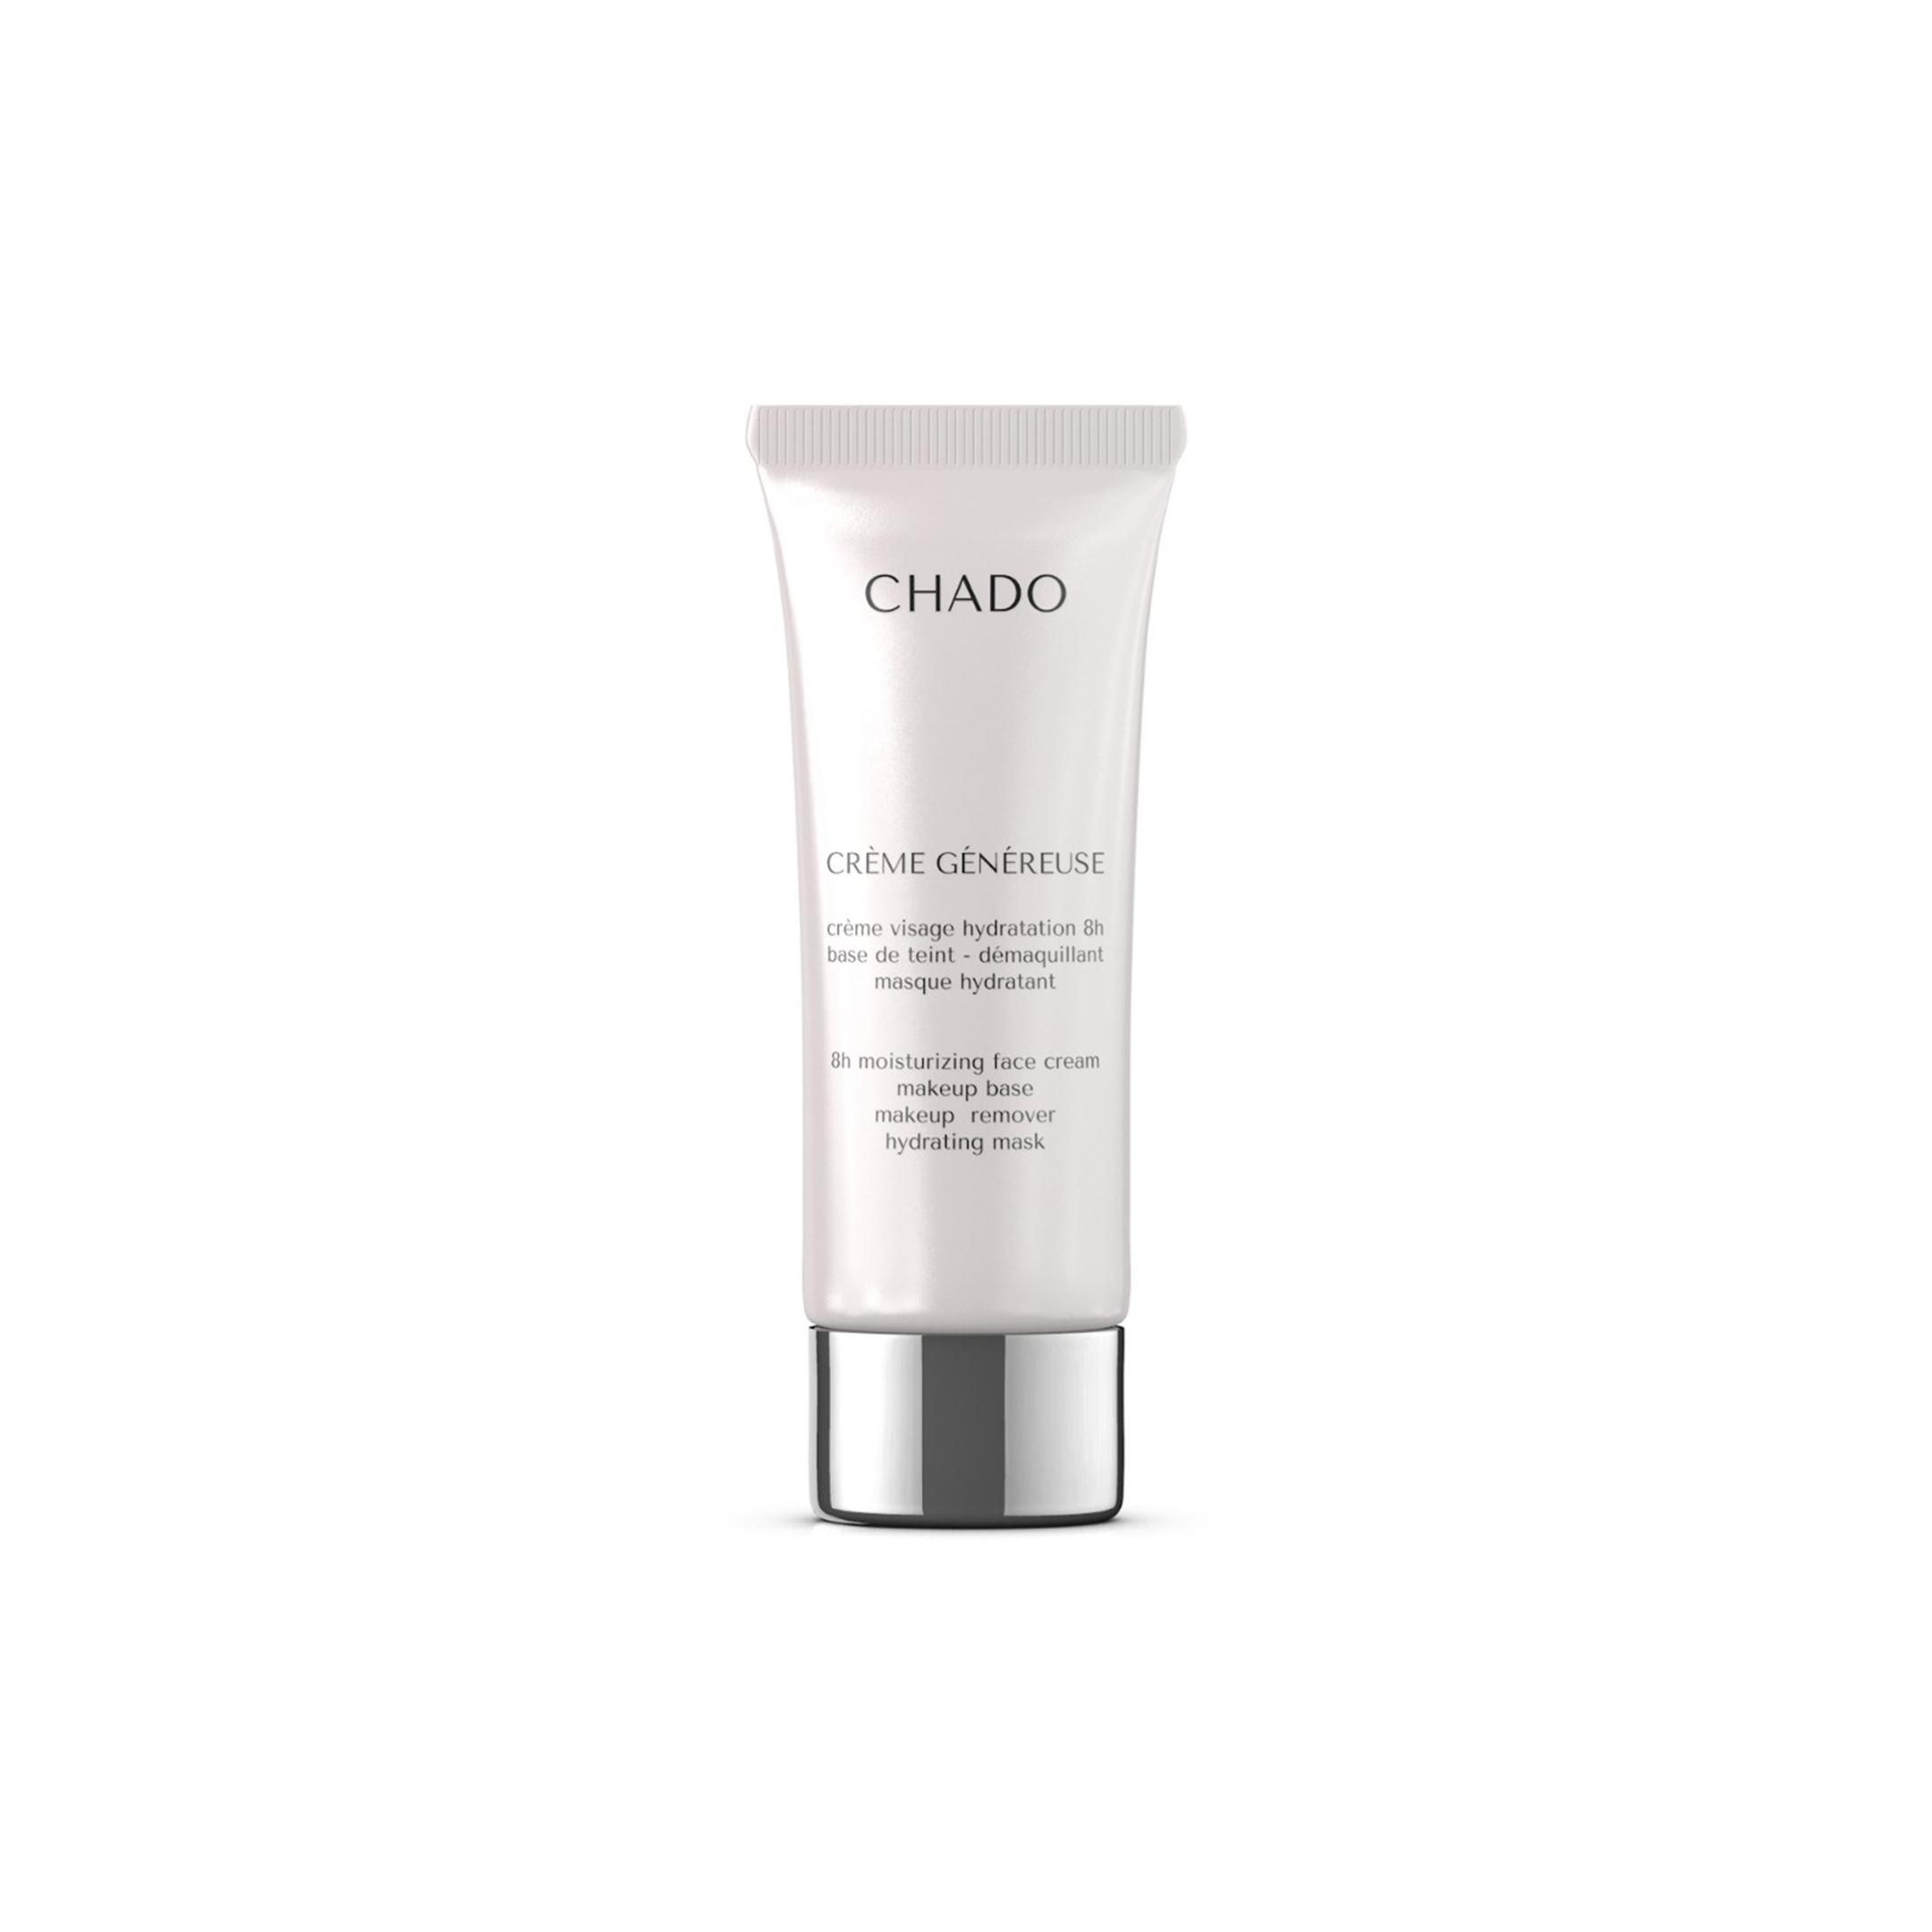 CHADO Creme 4-i-1